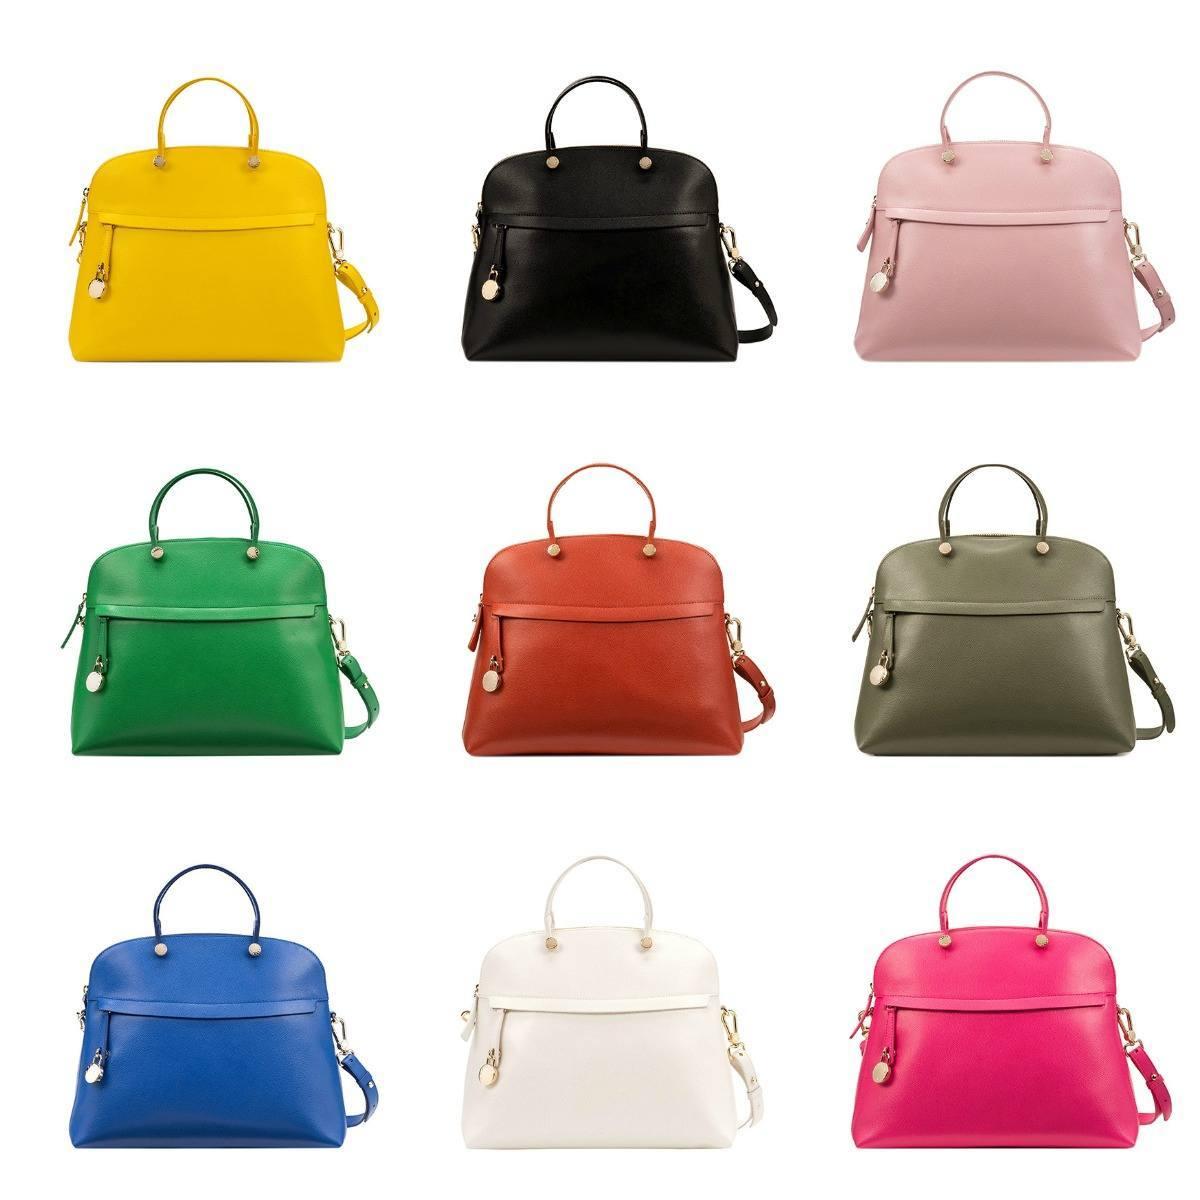 Borse Fendi Primavera 2015 : Celine borse opinioni handbags